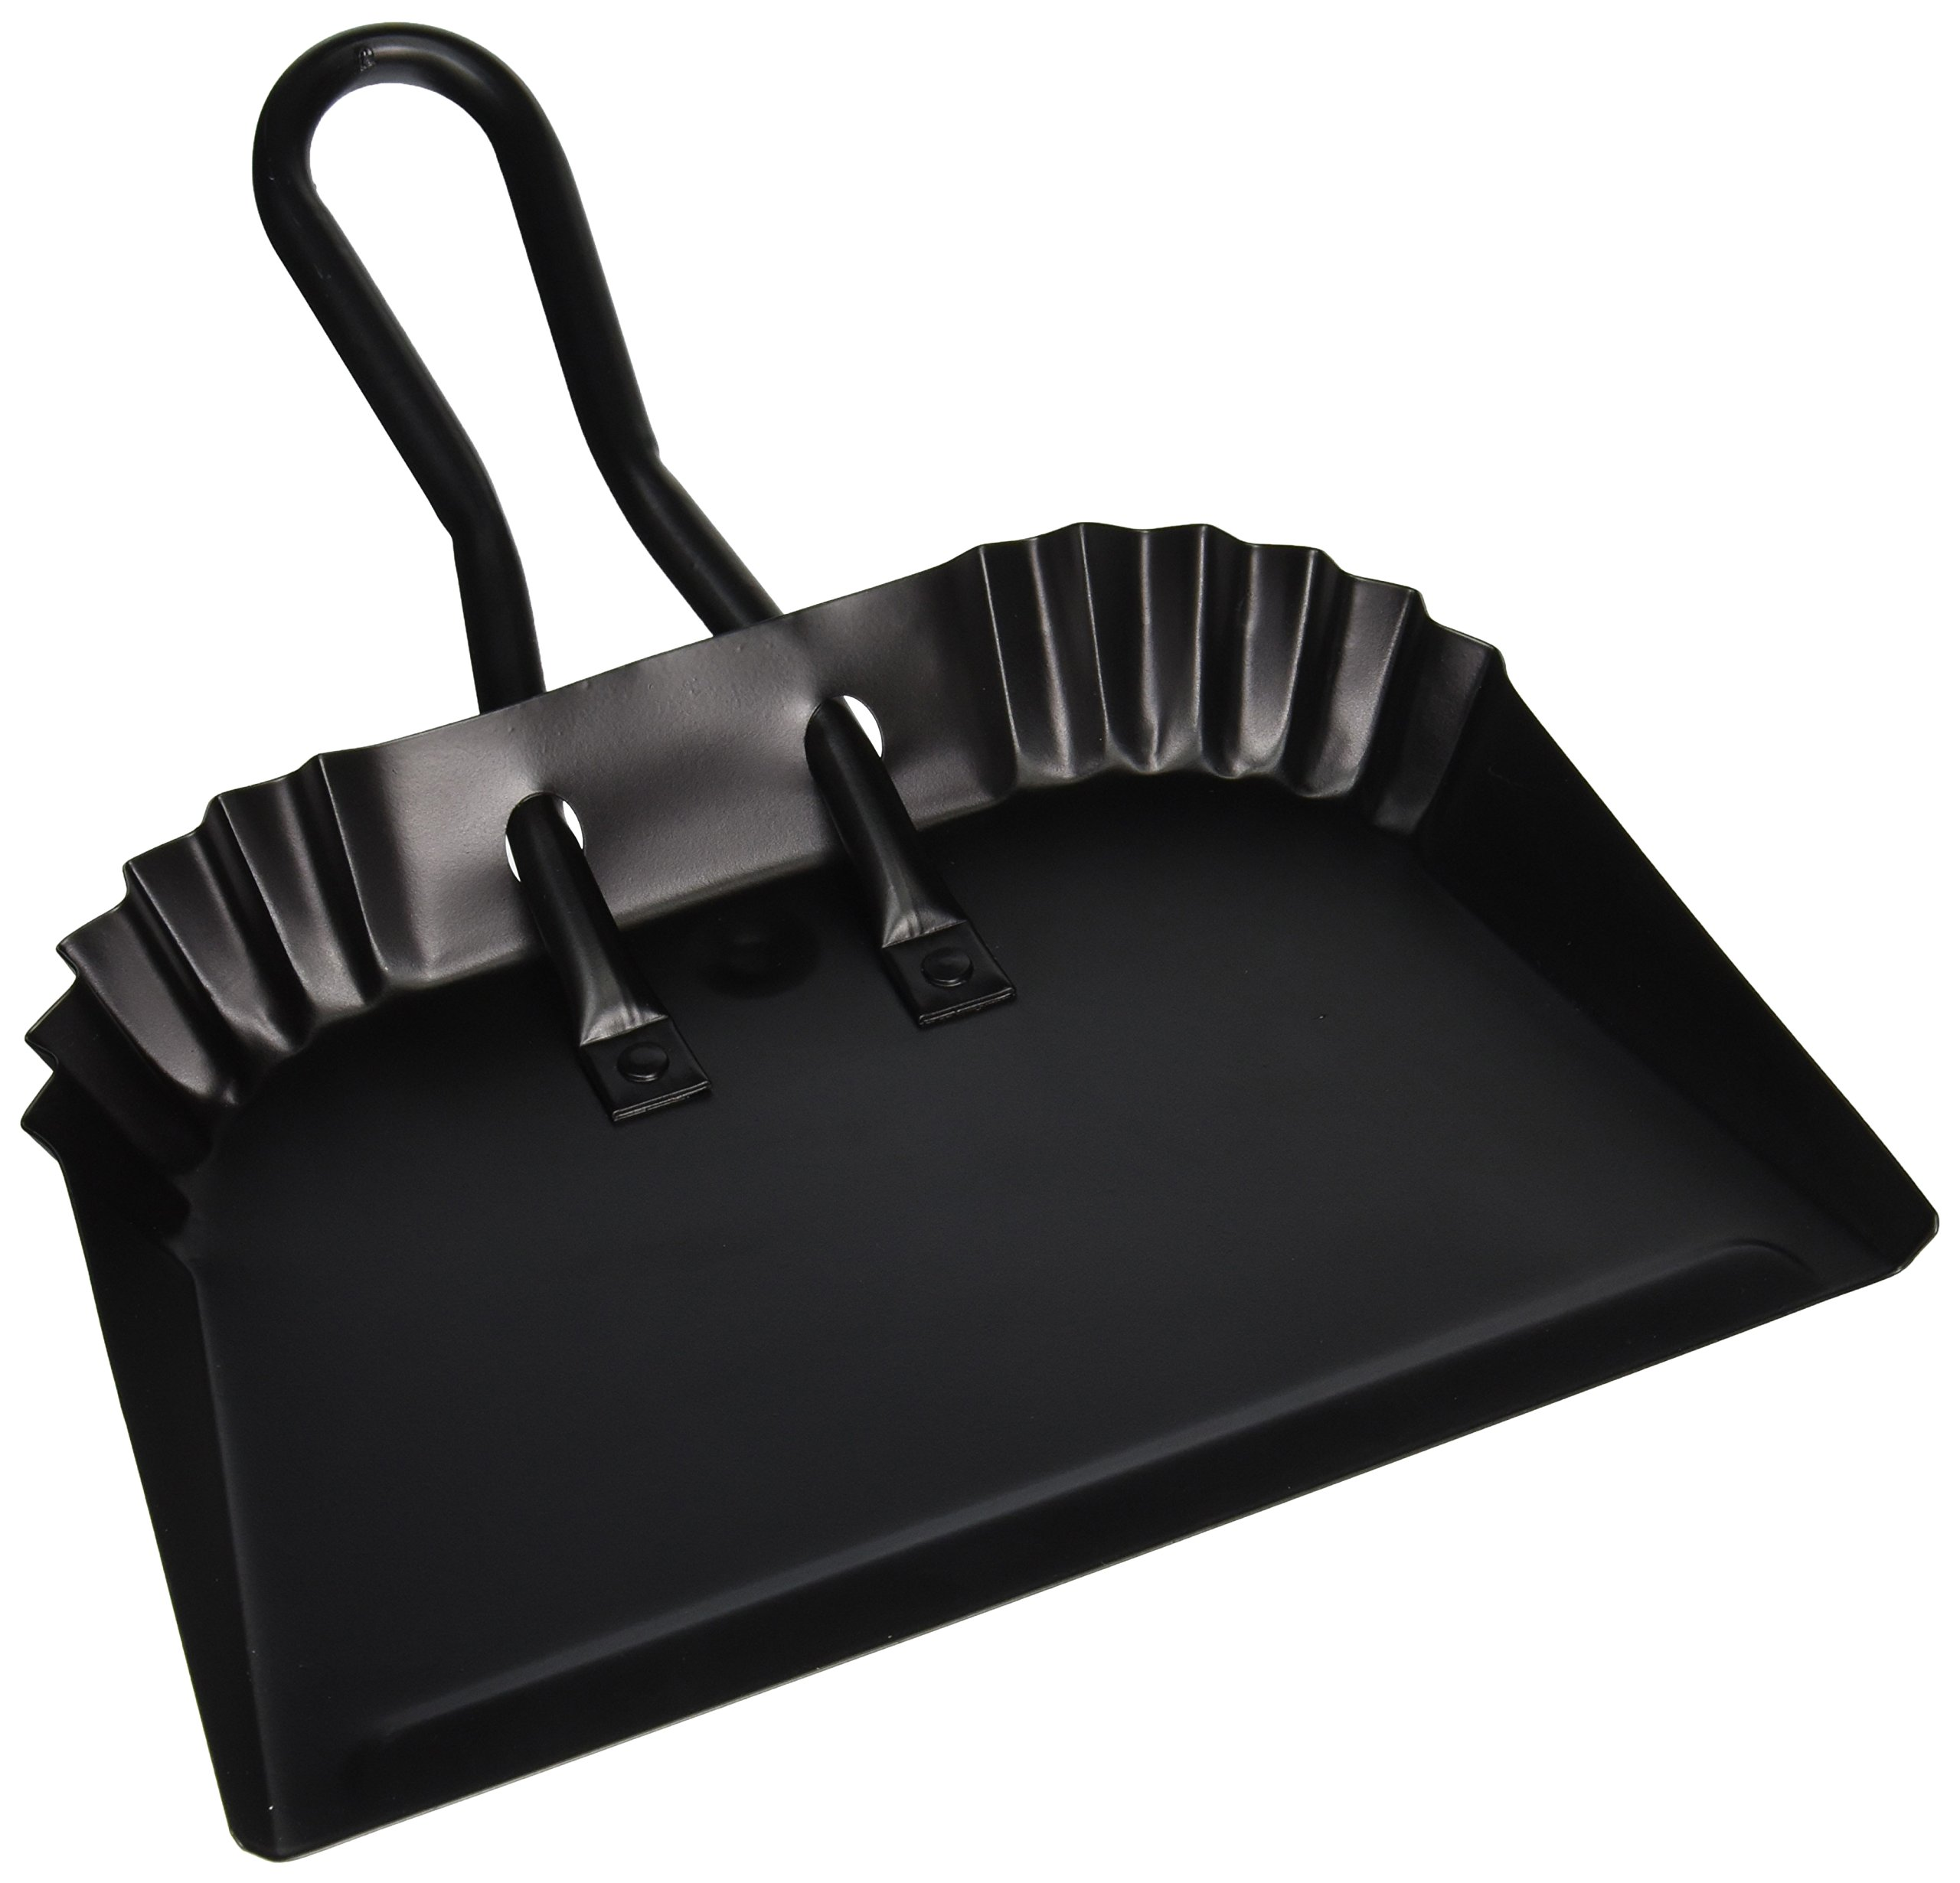 MintCraft Pro DL-5004 Dust Pan, 12-Inch, Black Finish